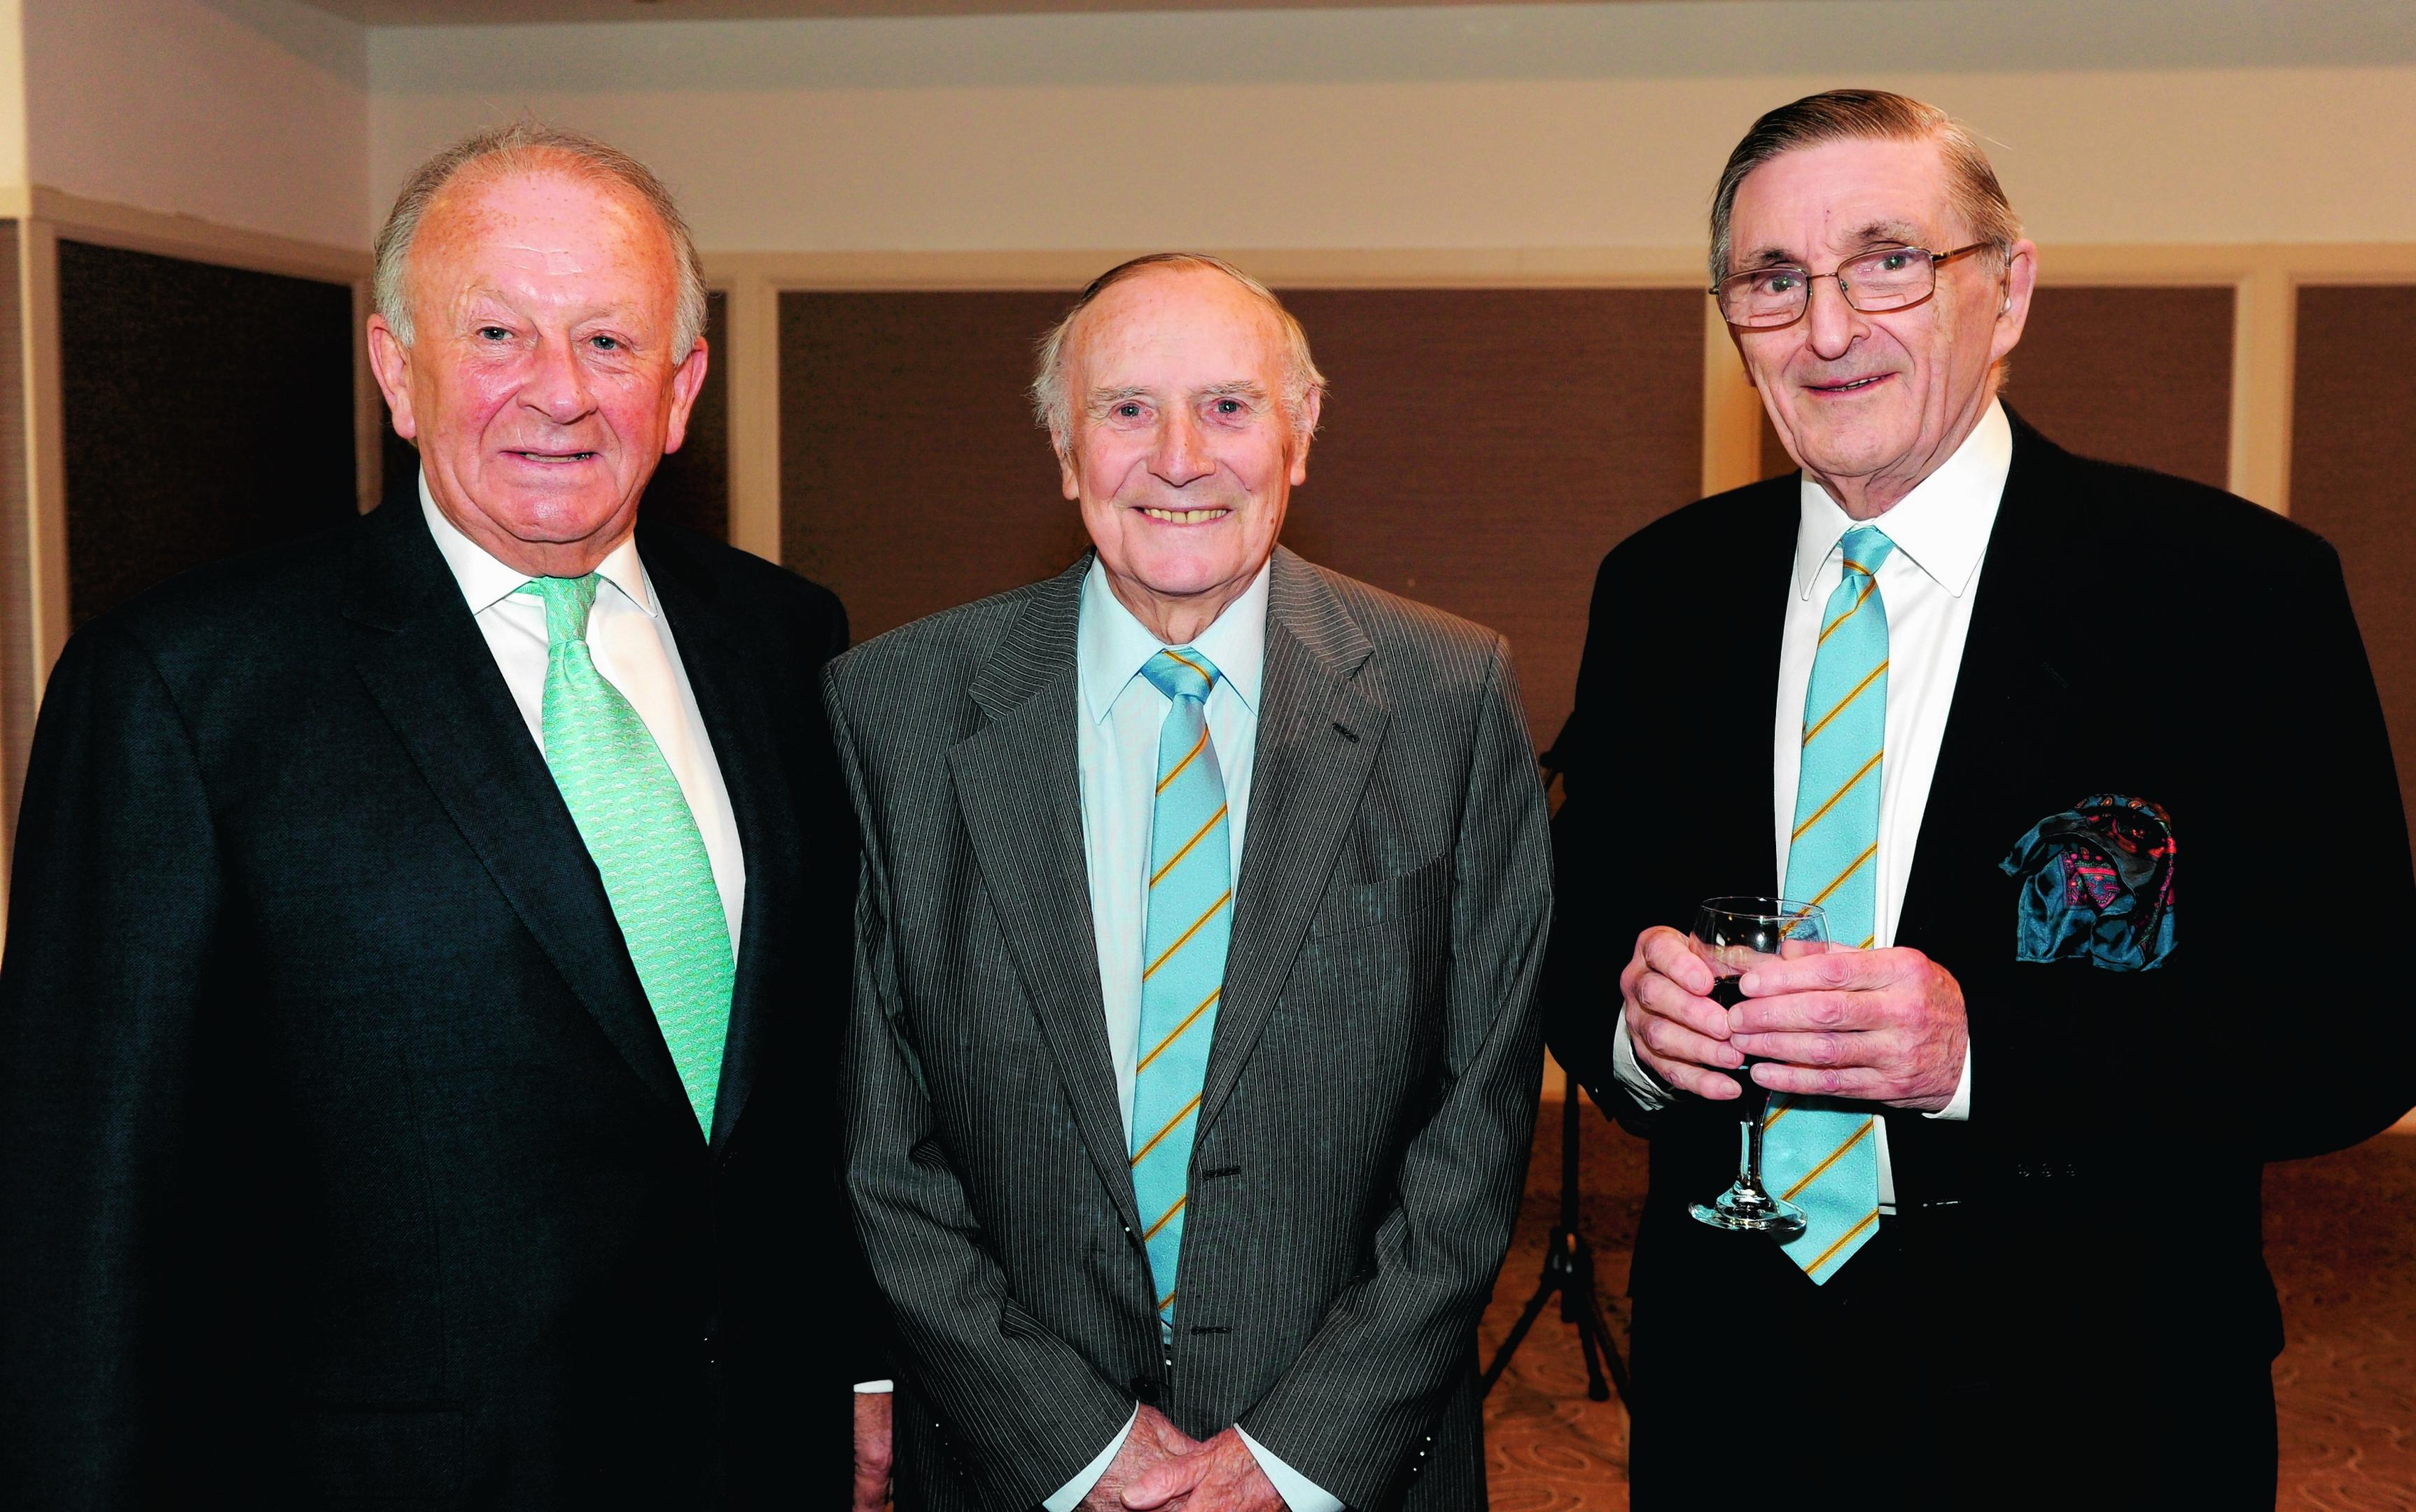 Stewart Spence, John McHardy and Buff Hardie